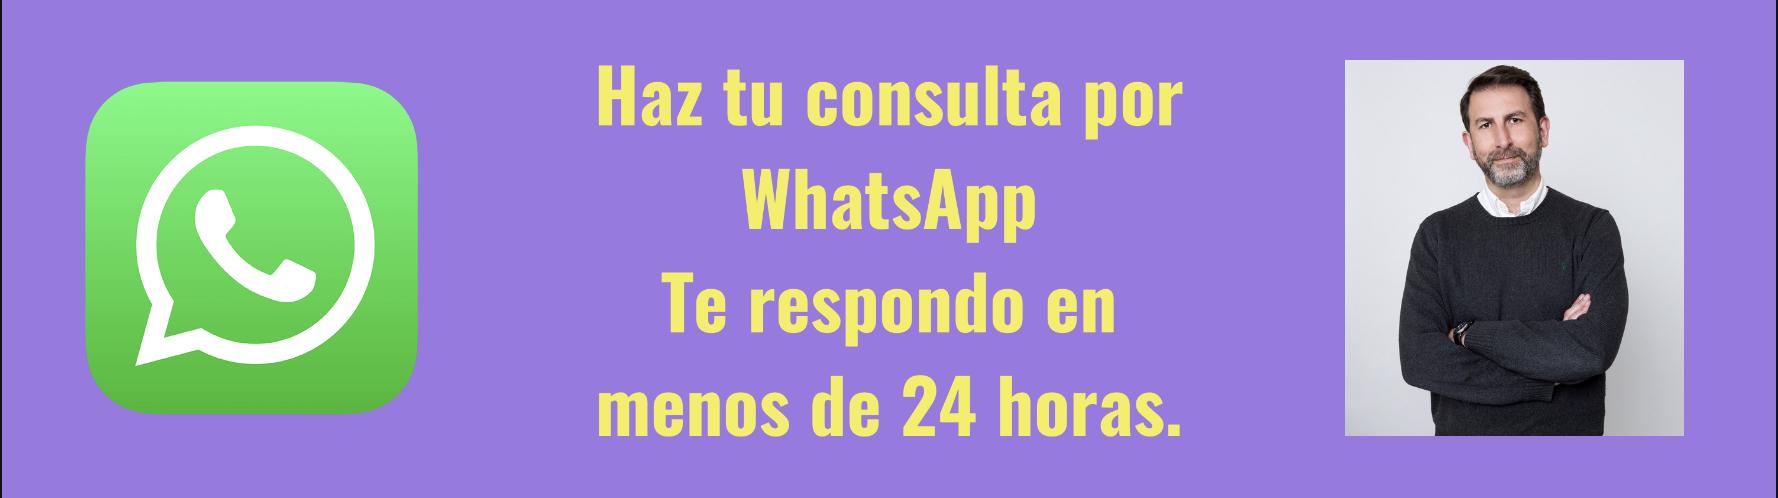 Consulta Online por WhatsApp al Pediatra Jesús Garrido